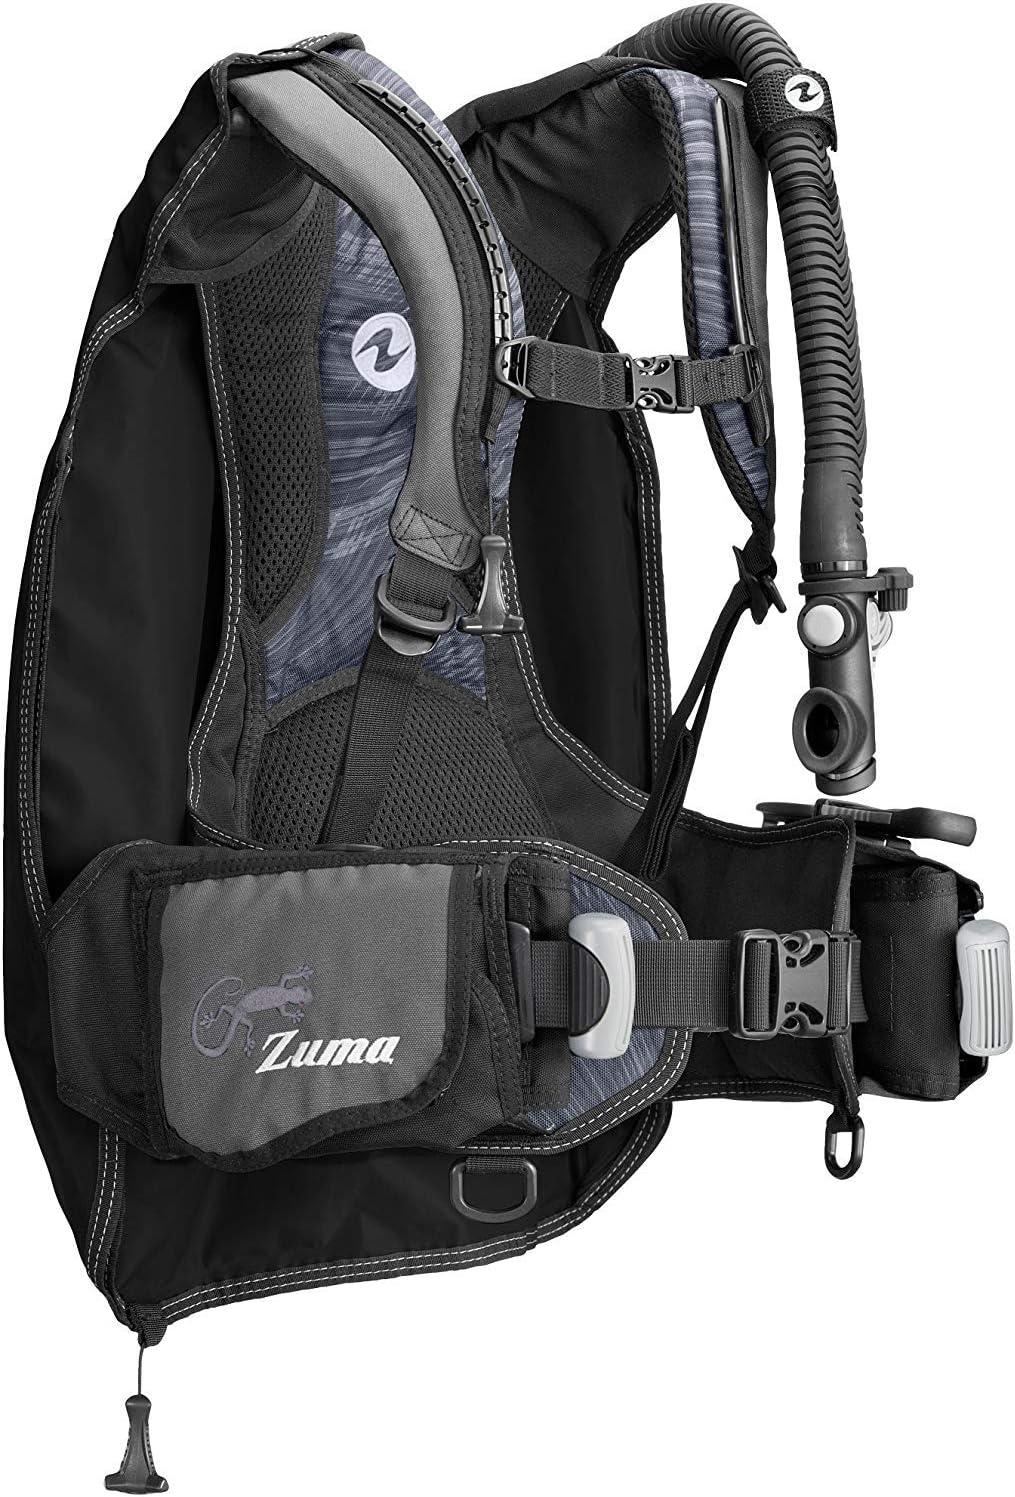 Aqua Lung 35% OFF Zuma Scuba Diving Limited time cheap sale SM Midnight MD Black BCD